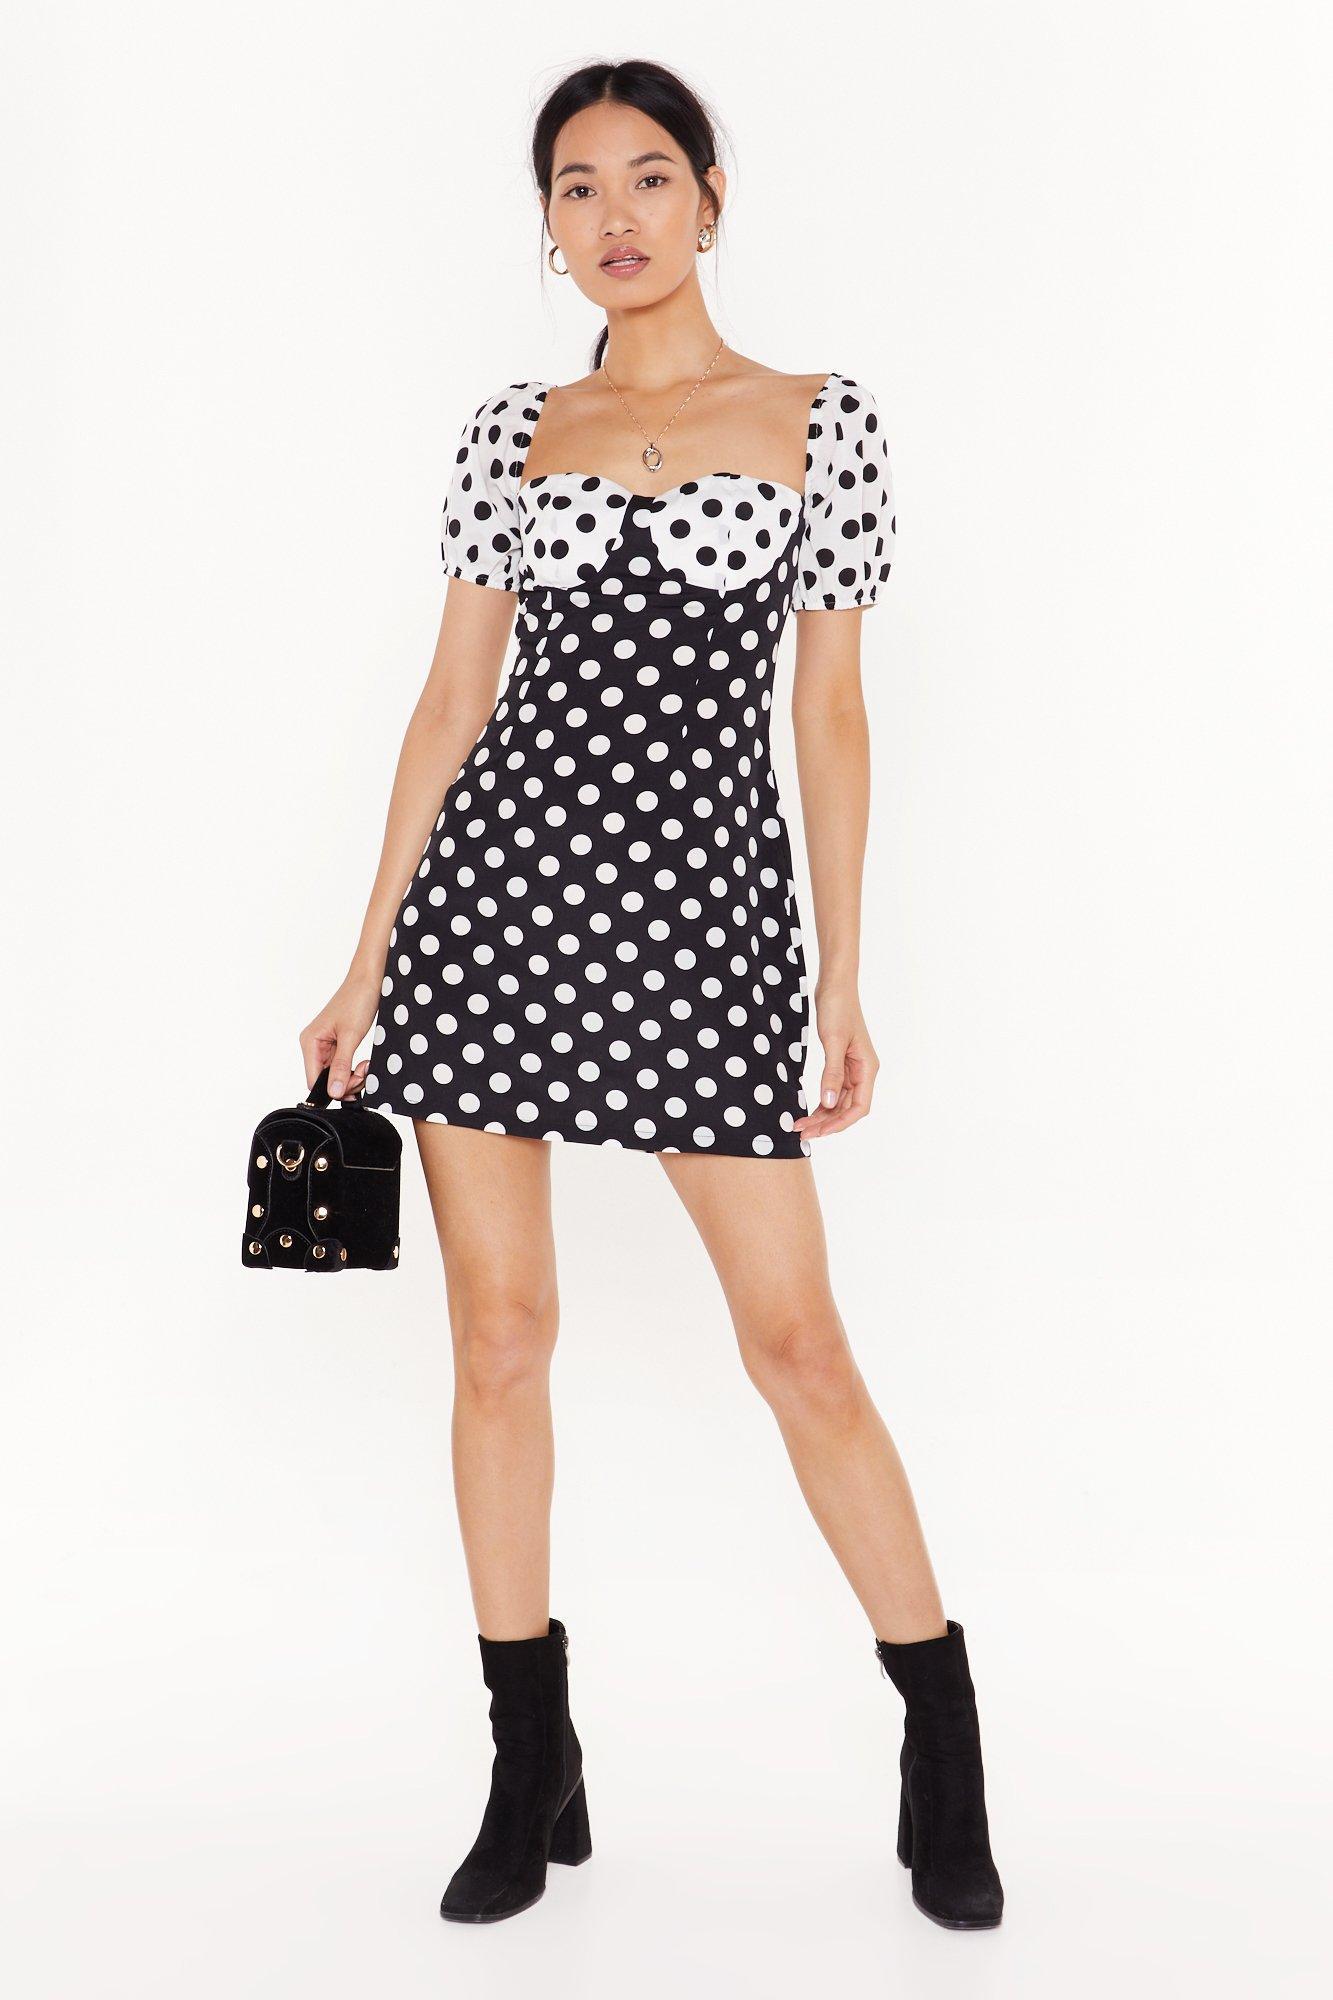 Image of It's Dot Cup to You Polka Dot Mini Dress